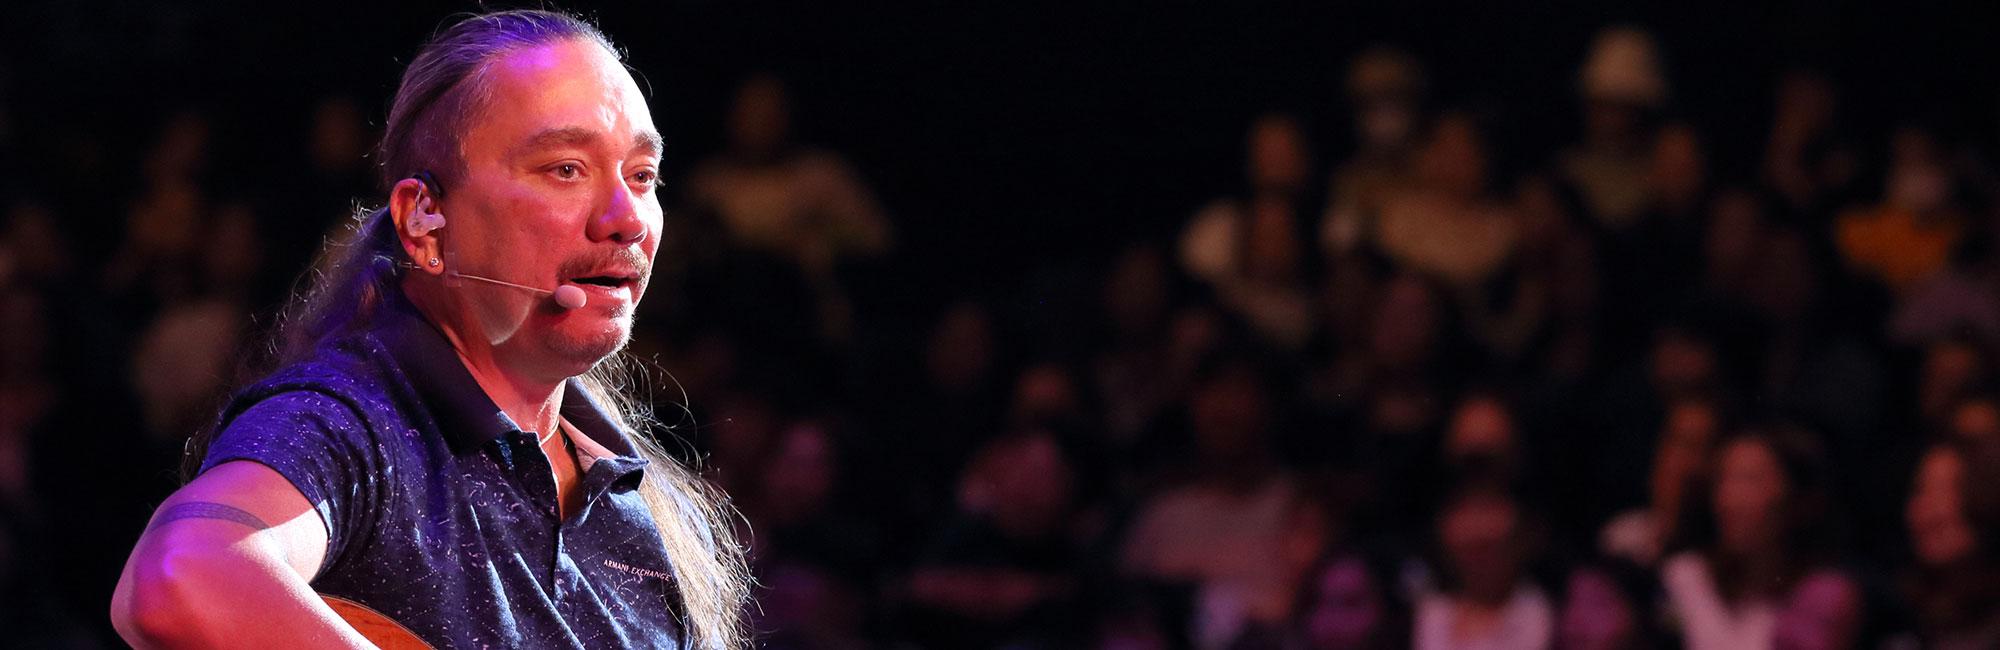 Keali'i Rechel Live in Maui Tour/ケアリイ・レイシェルライブマウイツアー